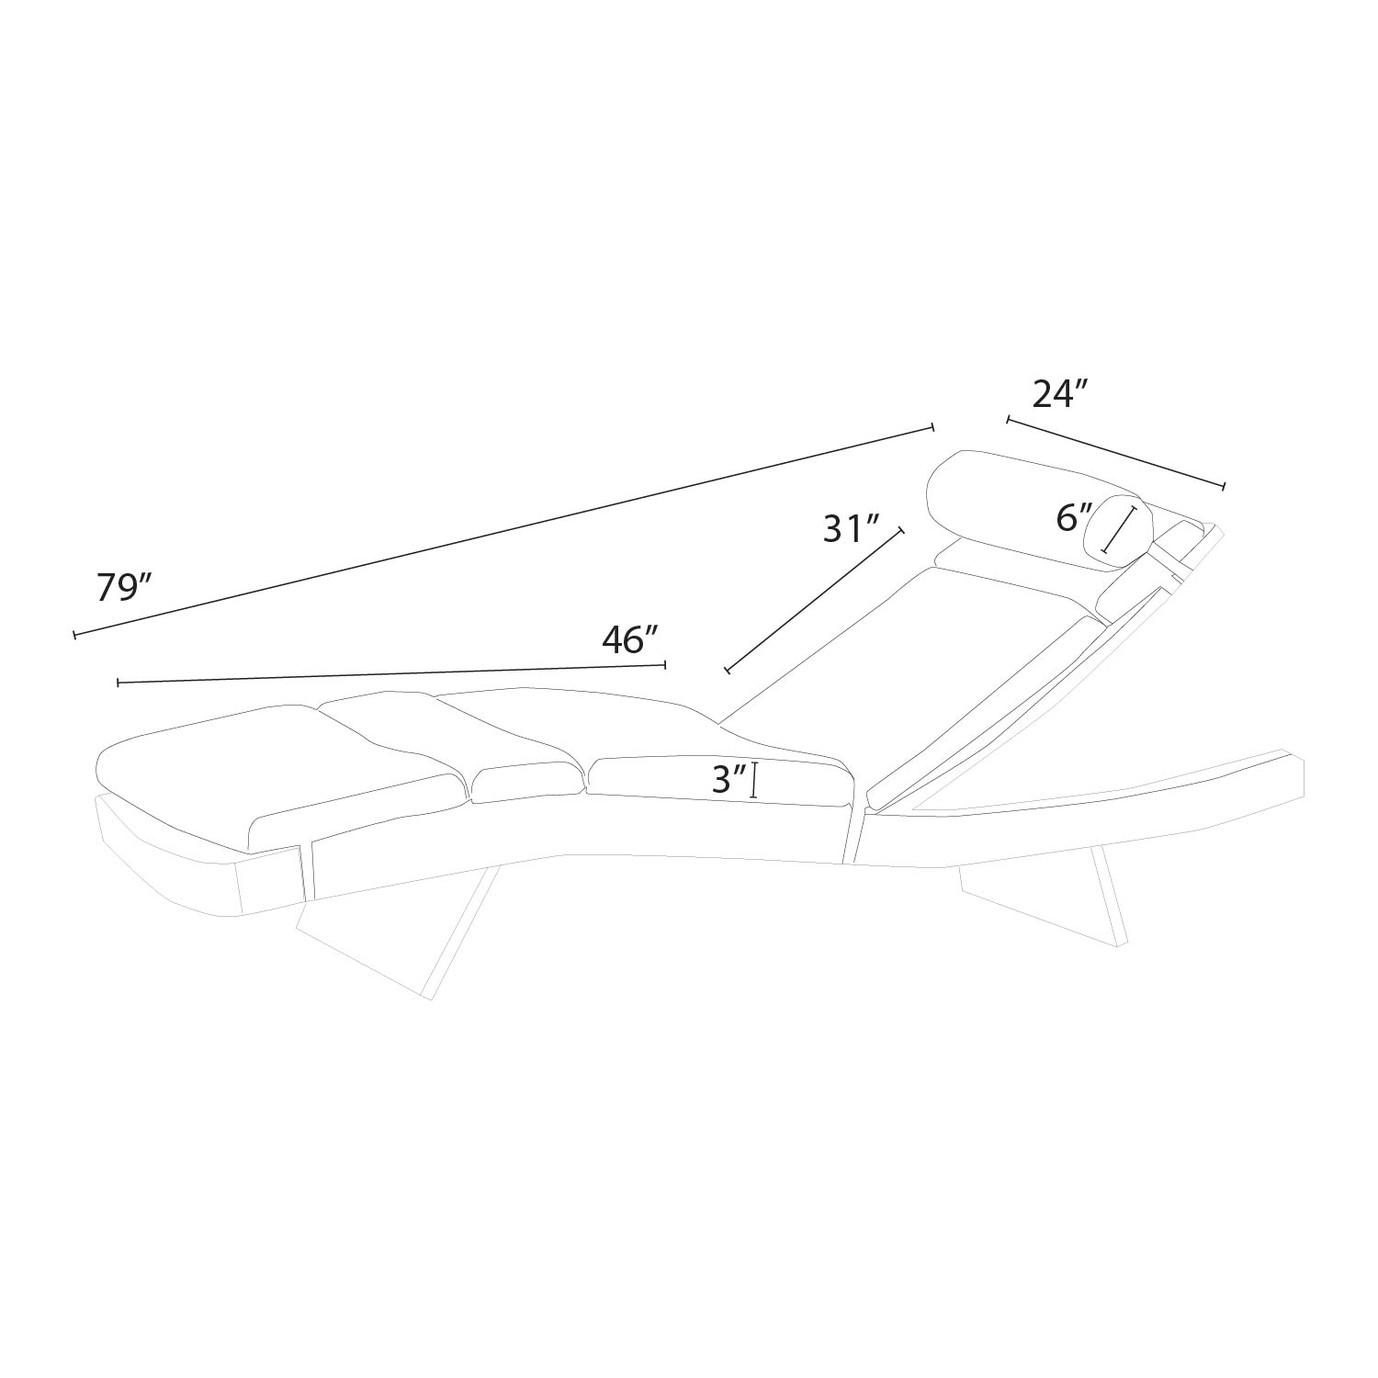 Portofino® Comfort 2pk Lounger Cushions - Taupe Mist